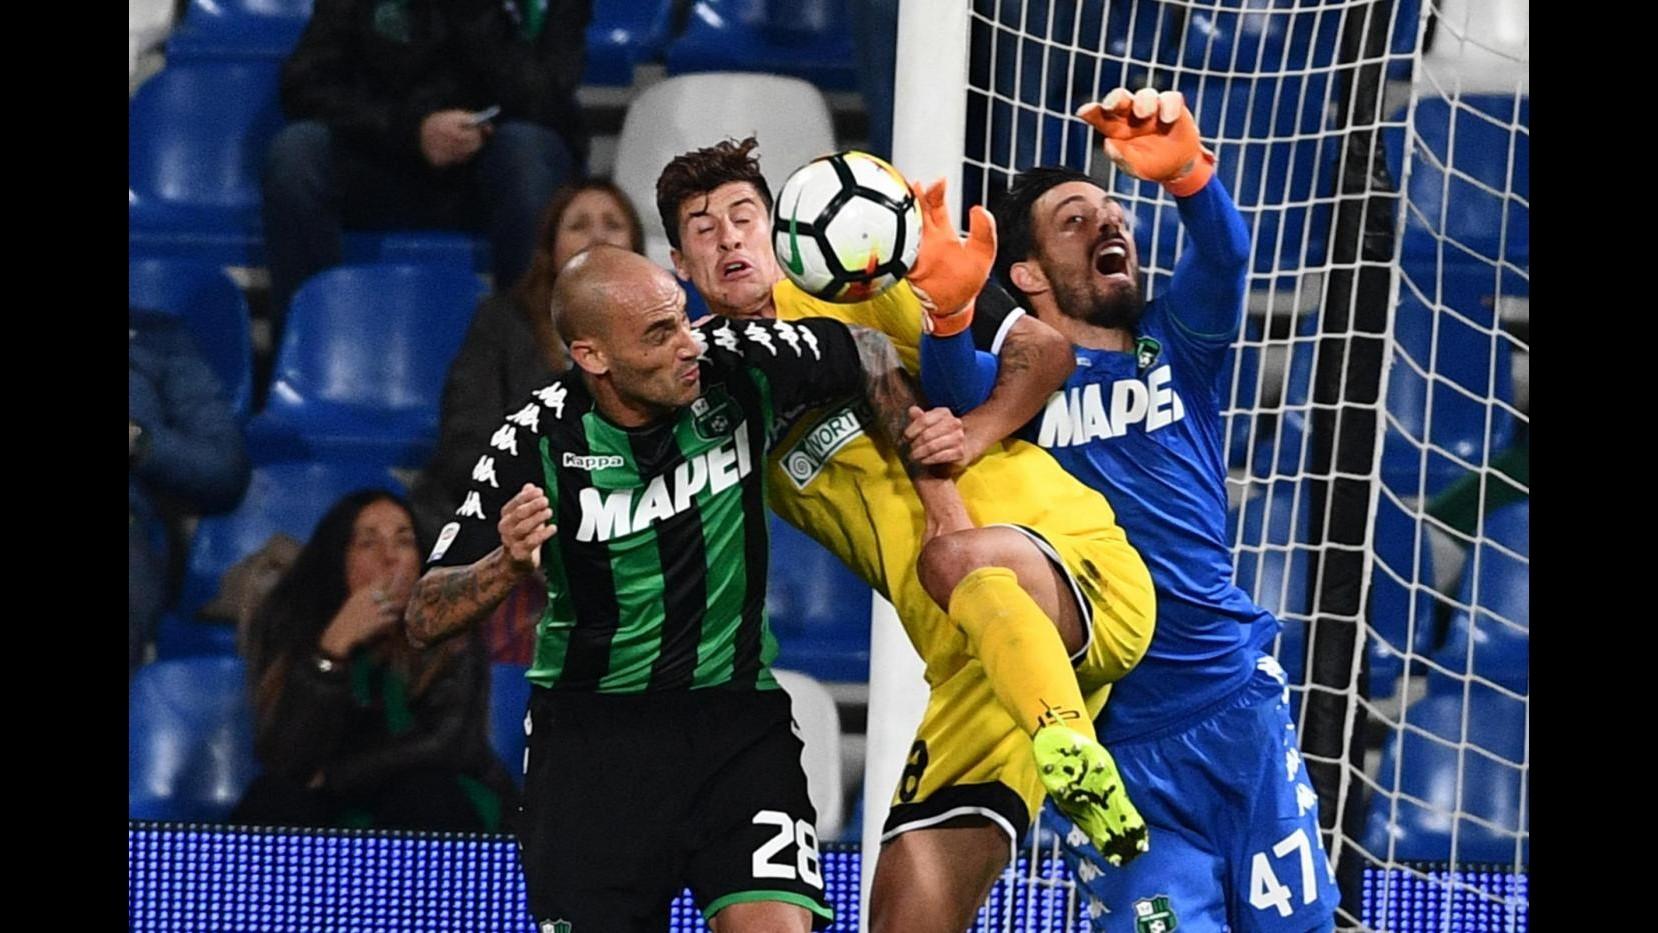 Serie A, Sassuolo – Udinese 0-1 – IL FOTORACCONTO